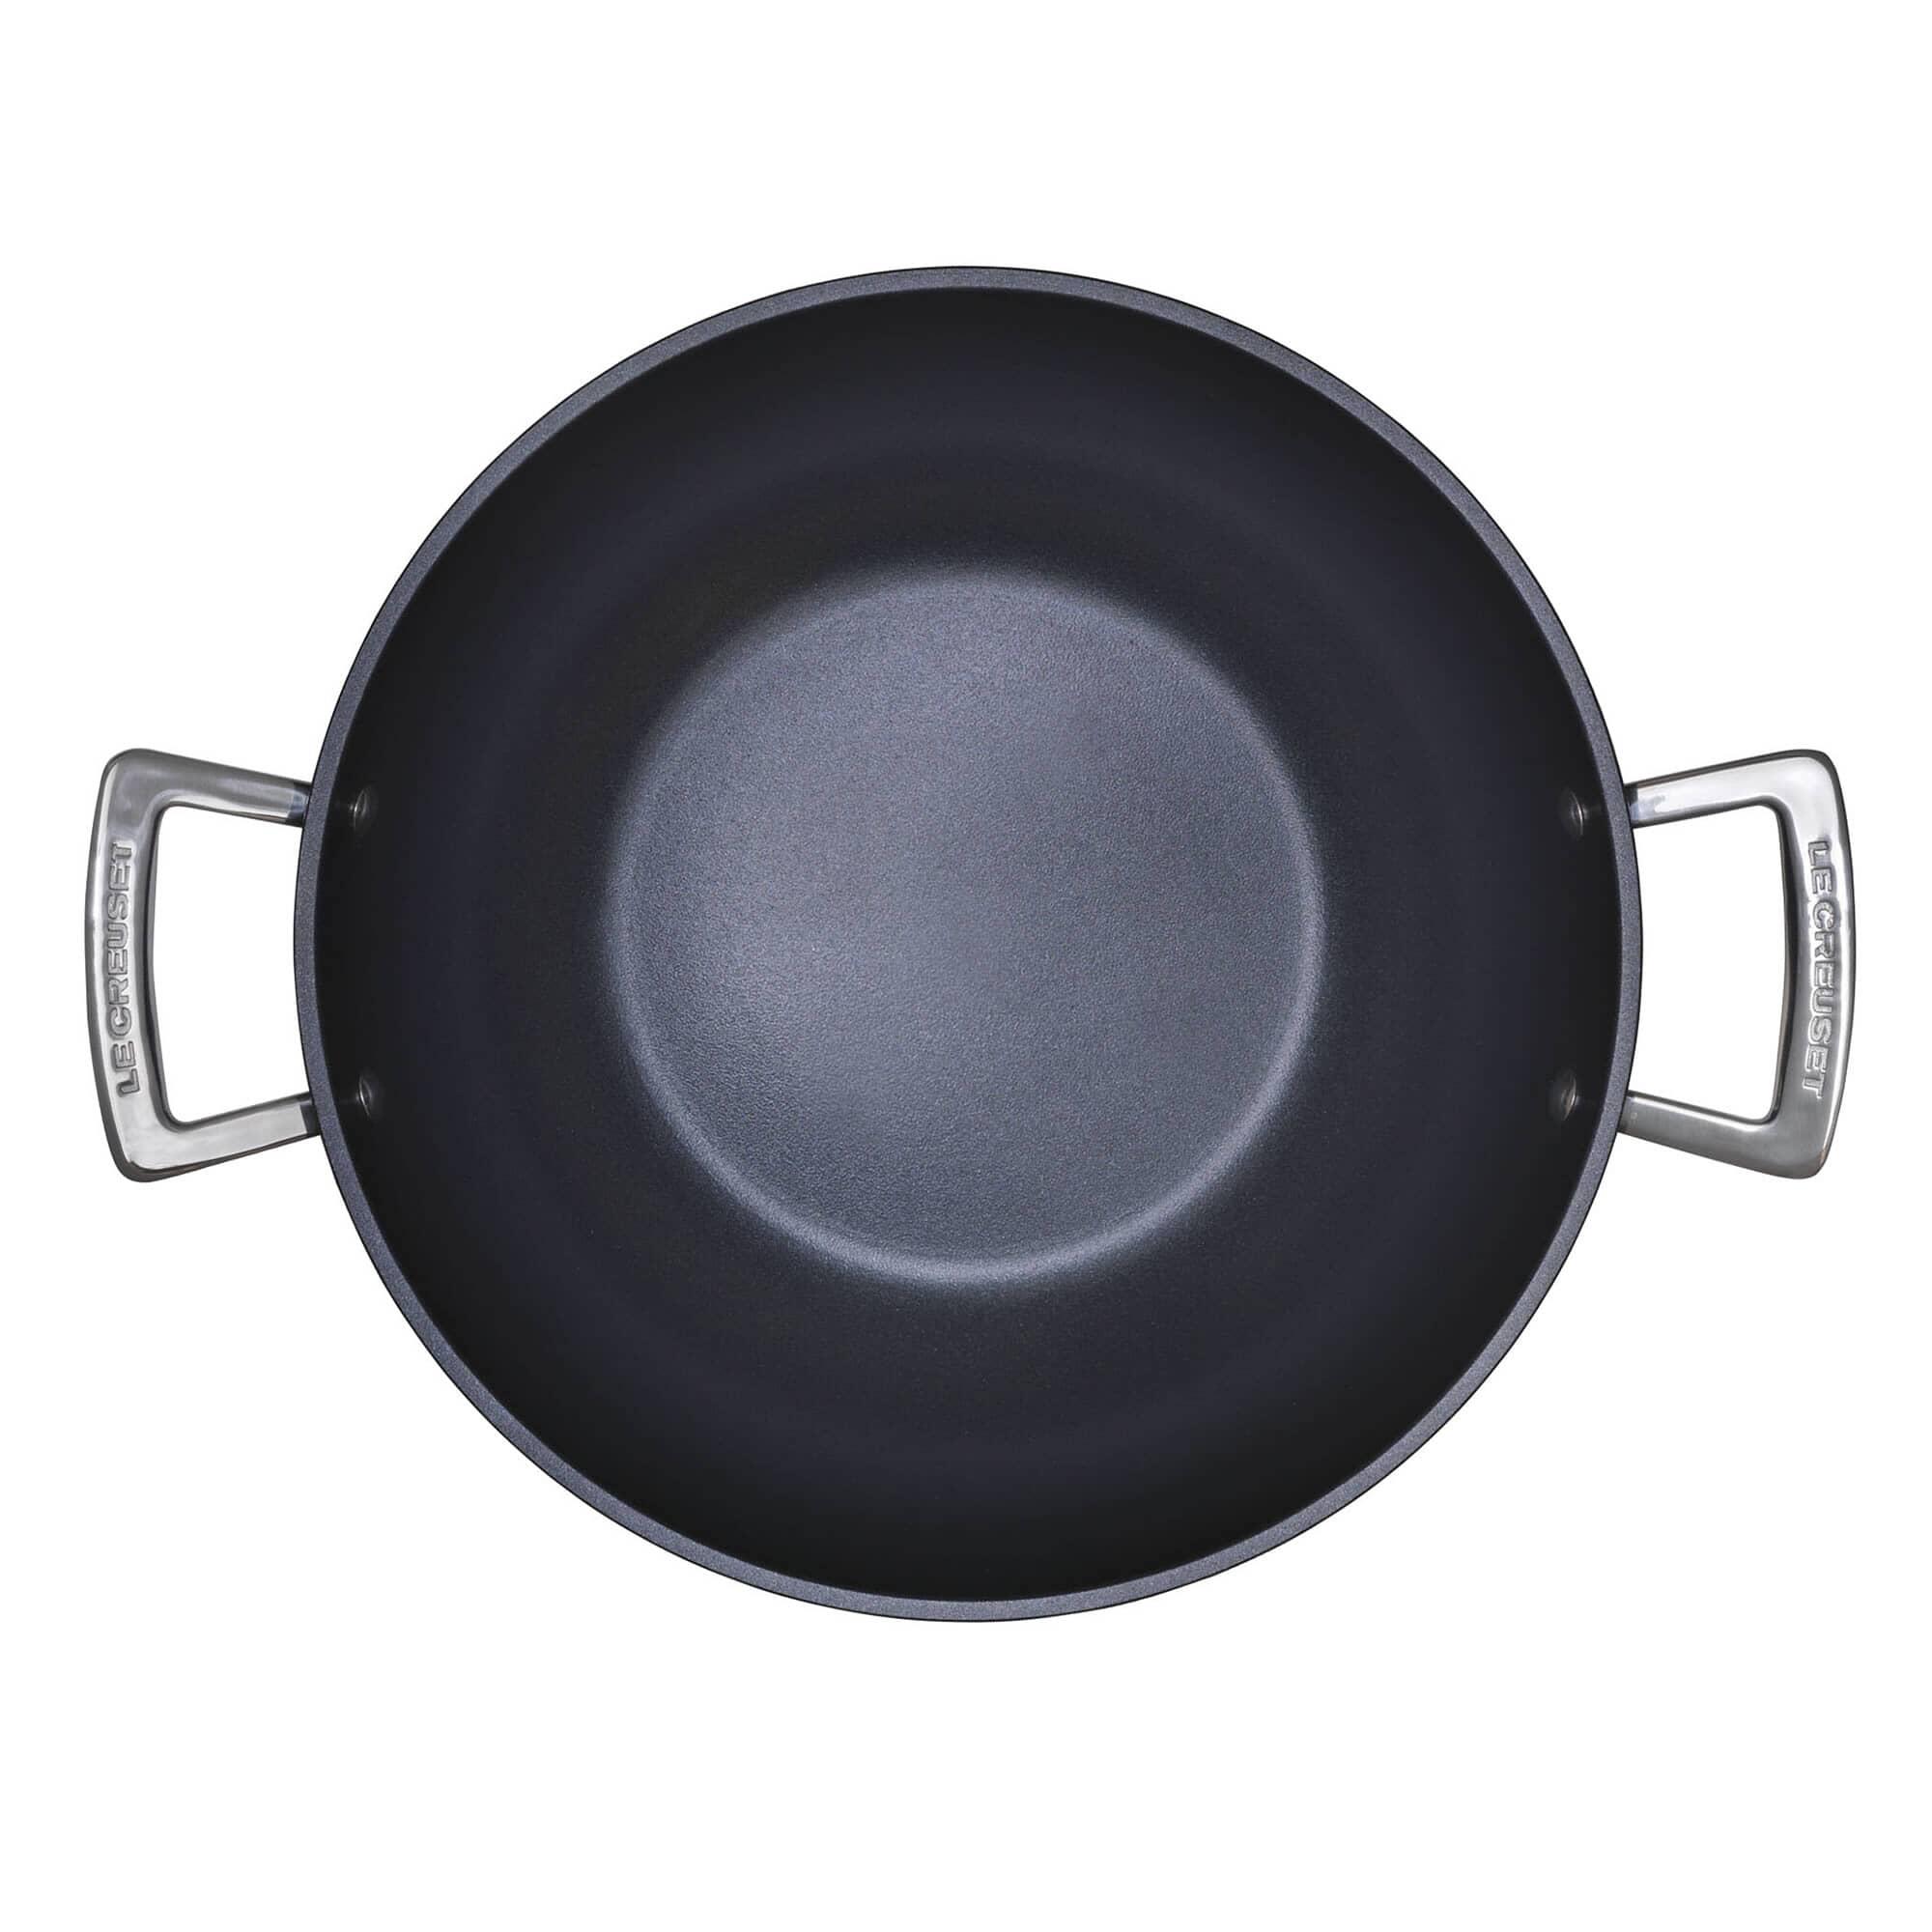 Le Creuset Tns 28cm Wok Stir Fry Pan 962011280 Ecookshop